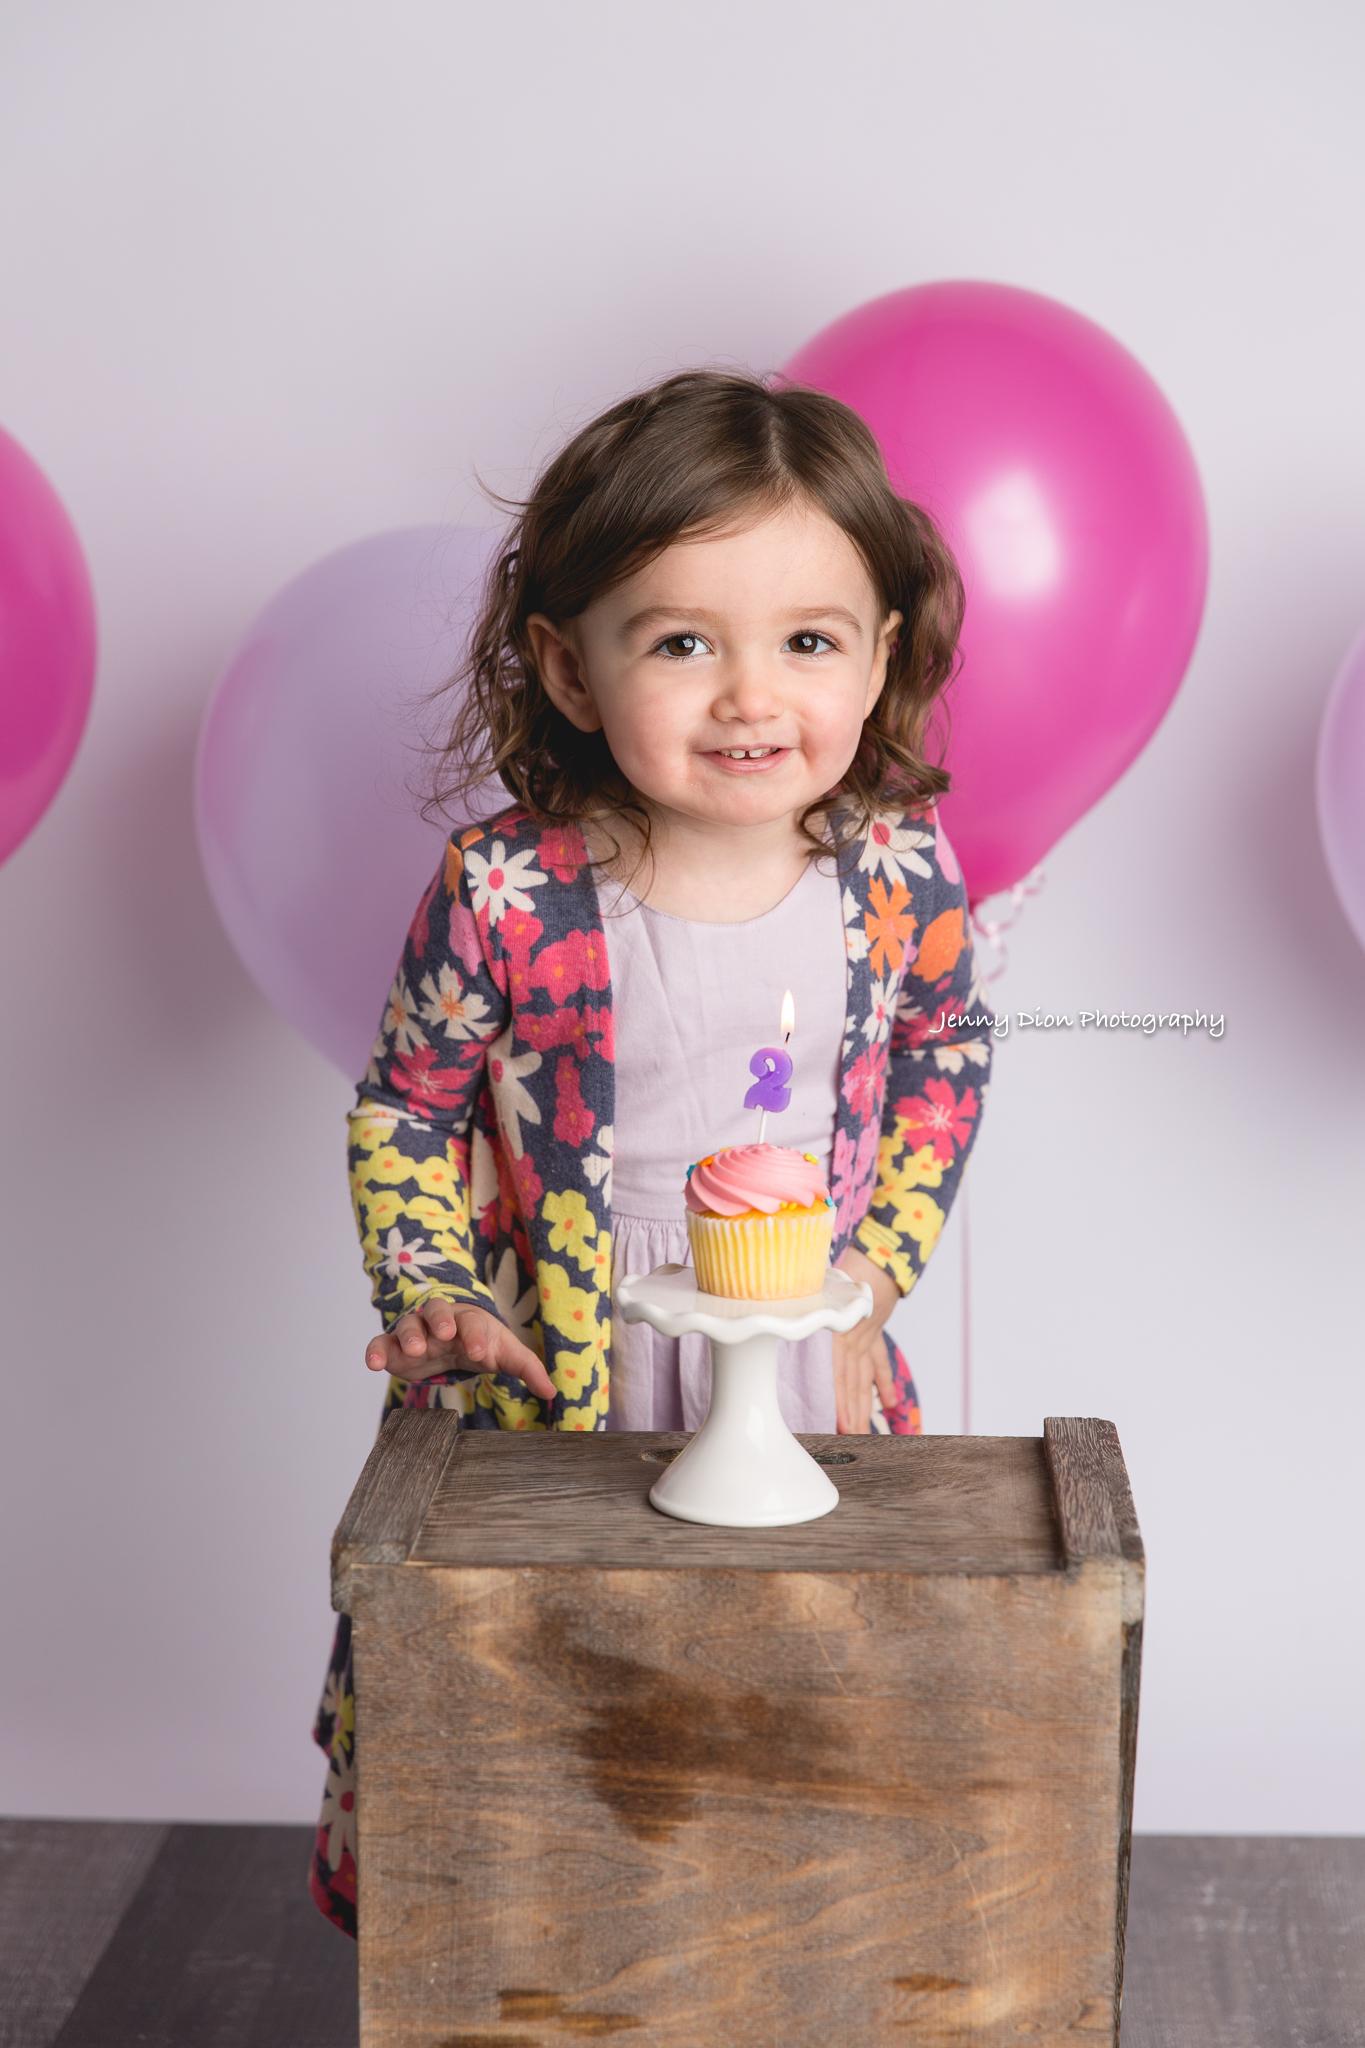 Singing happy birthday to her!